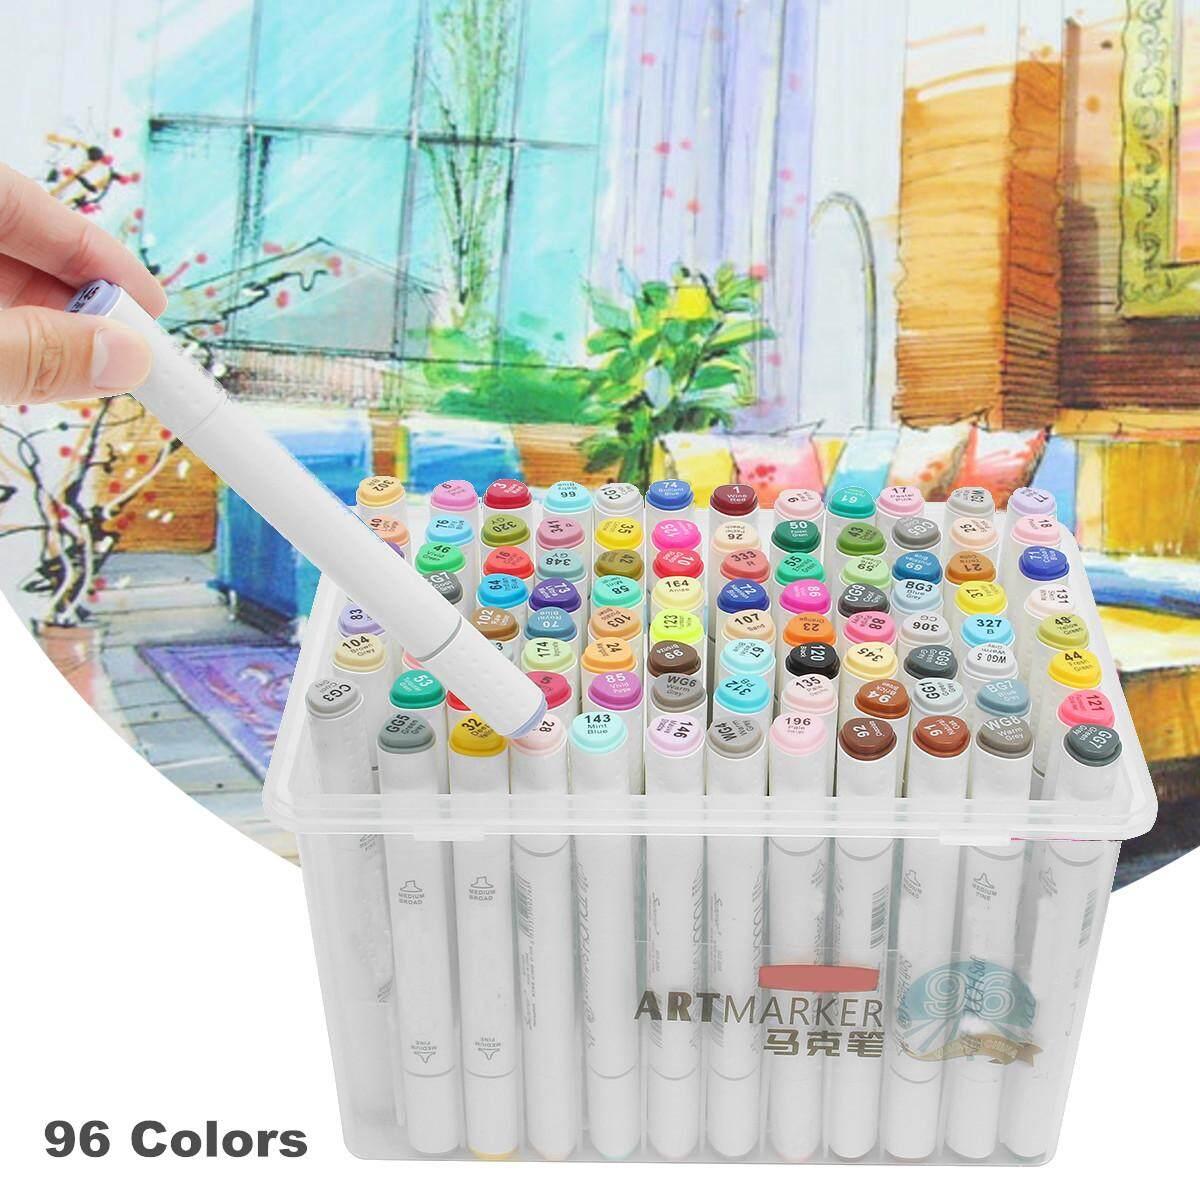 Fashion 96 Pcs Warna-warni Artis Sketsa Marker Berbasis Minyak Seni Ujung Ganda Papan Menggambar